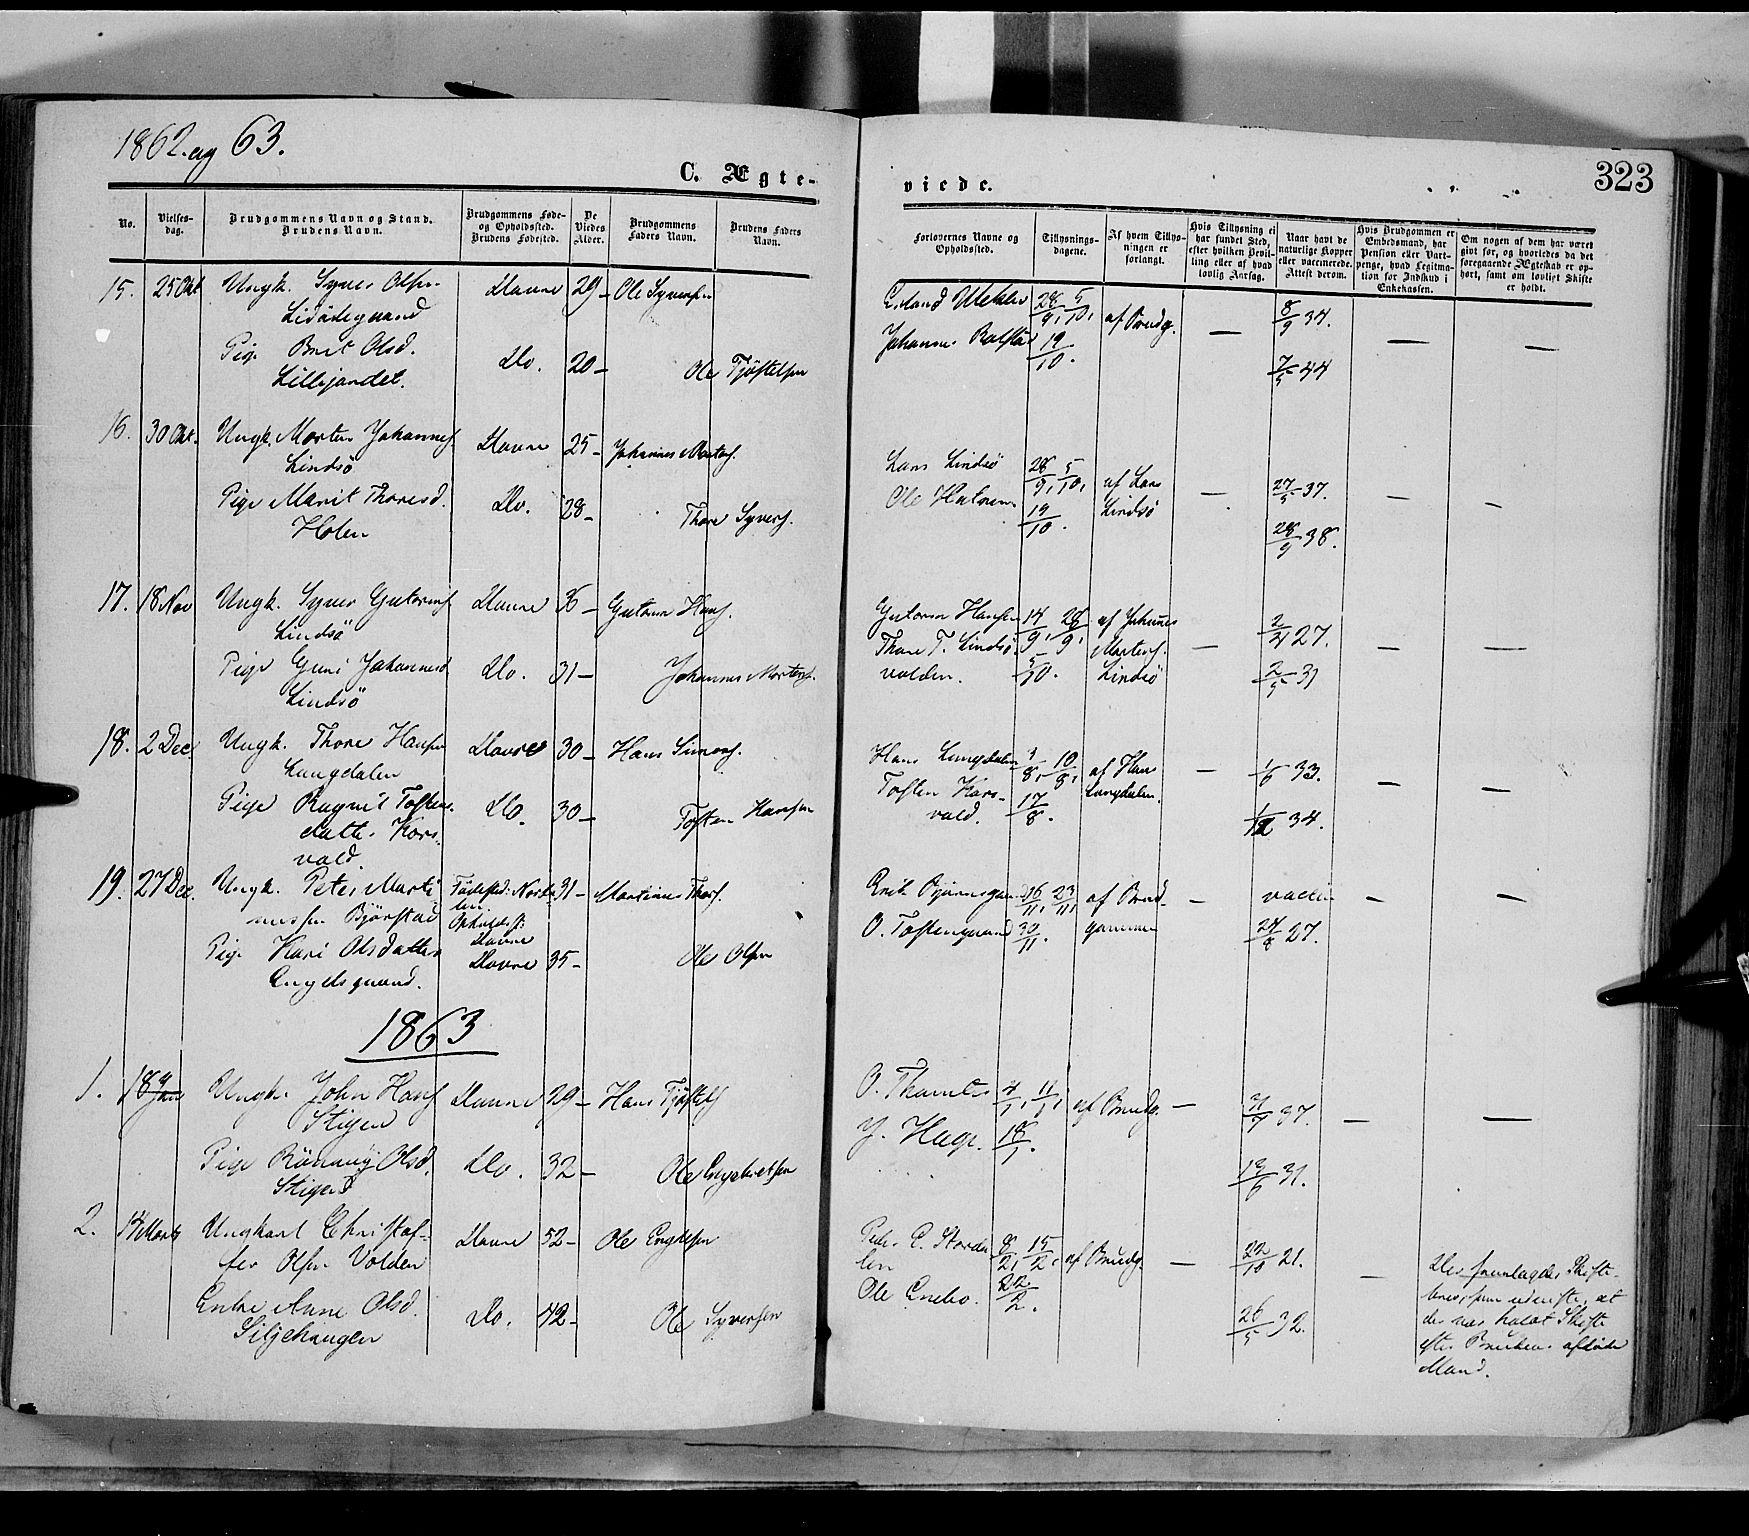 SAH, Dovre prestekontor, Ministerialbok nr. 1, 1854-1878, s. 323